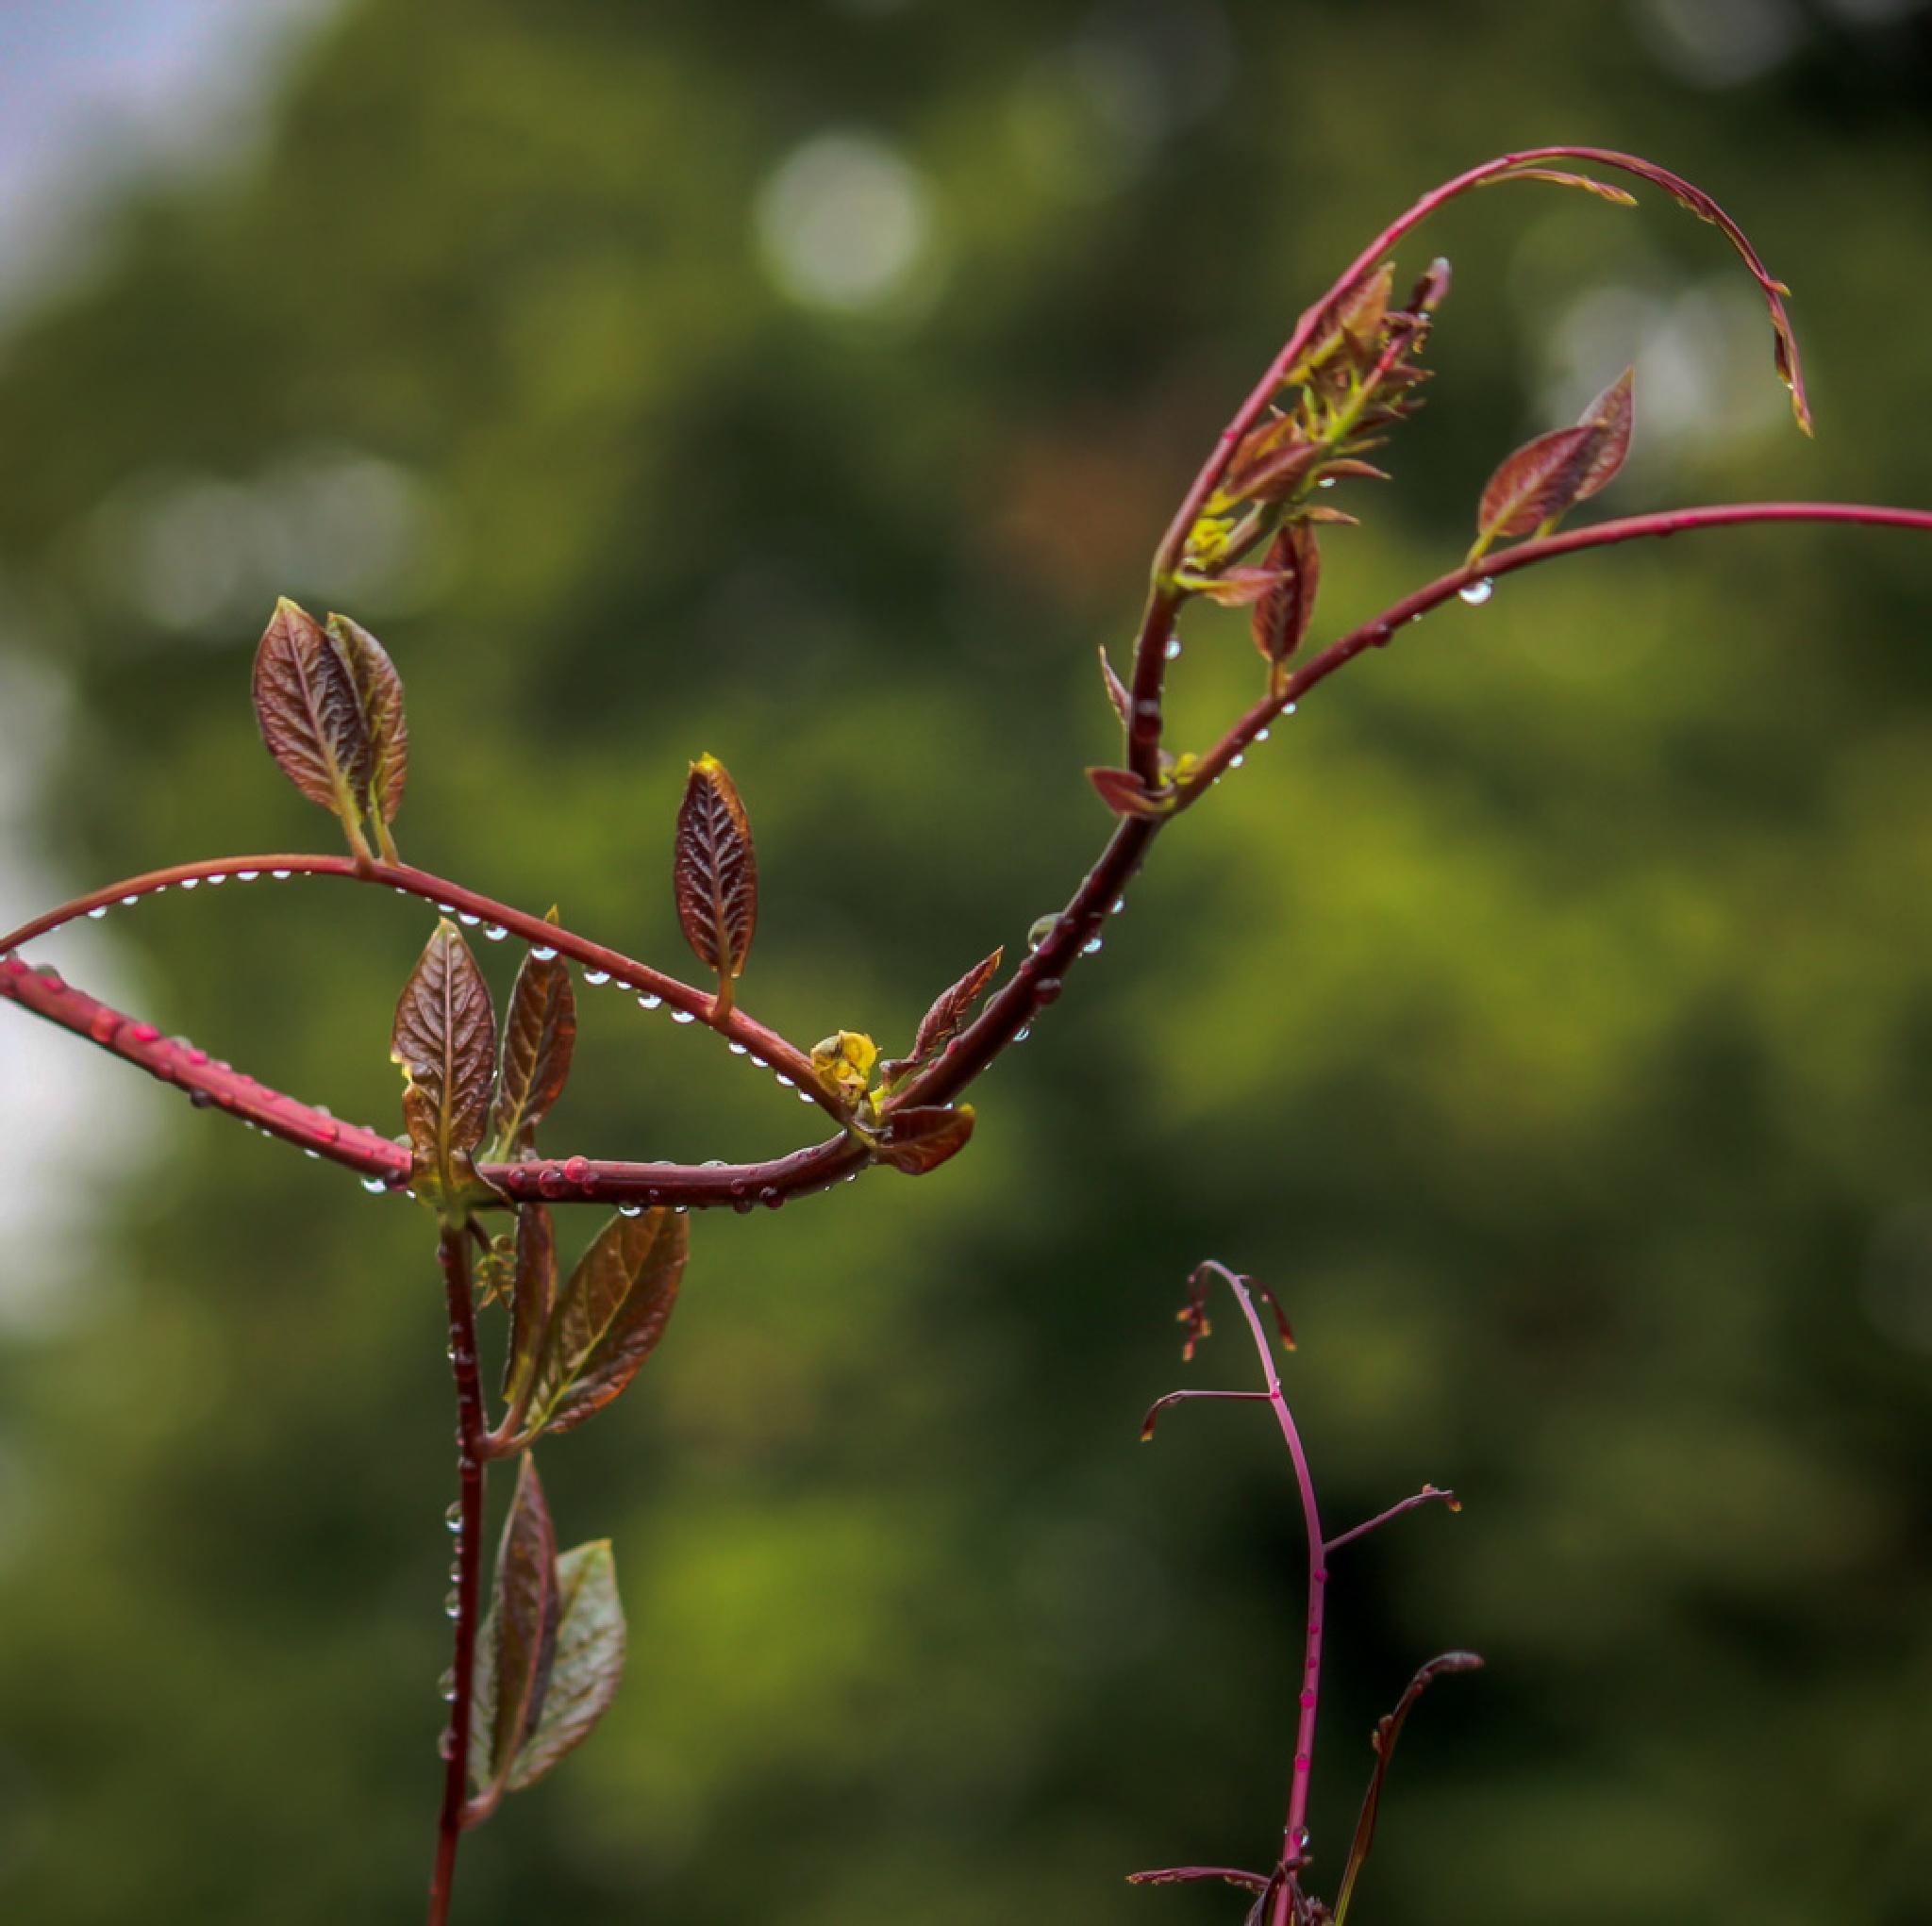 Leaves in rain by barbro.hansson.9